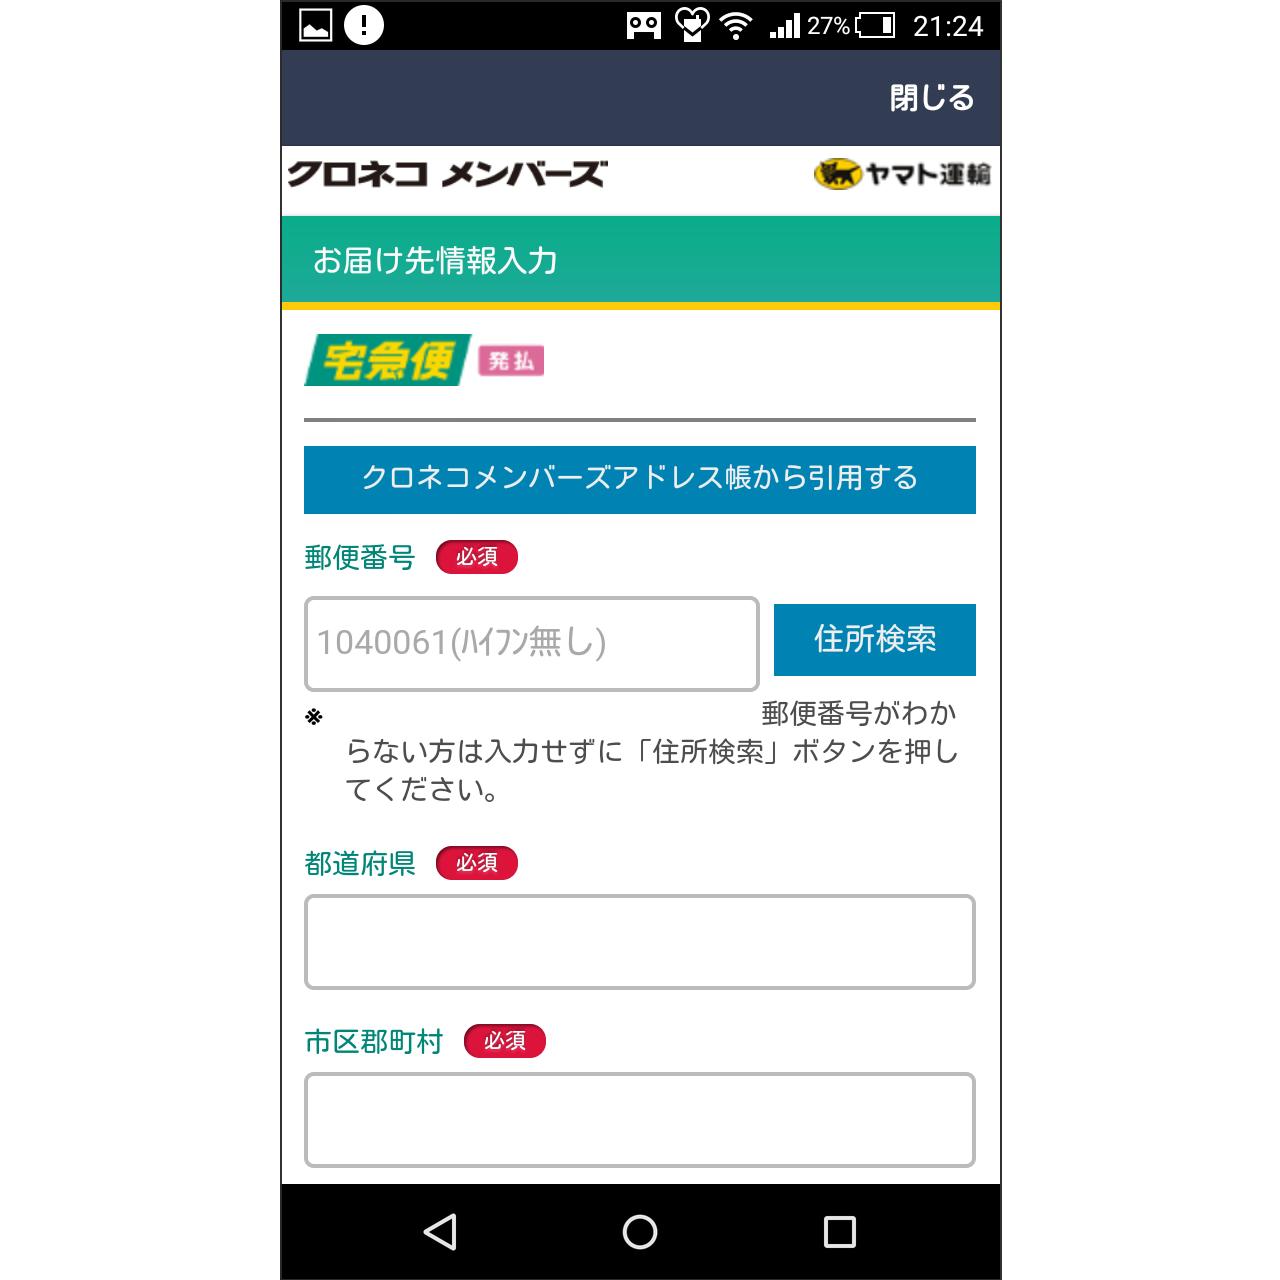 screenshot_2016-09-09-21-24-21